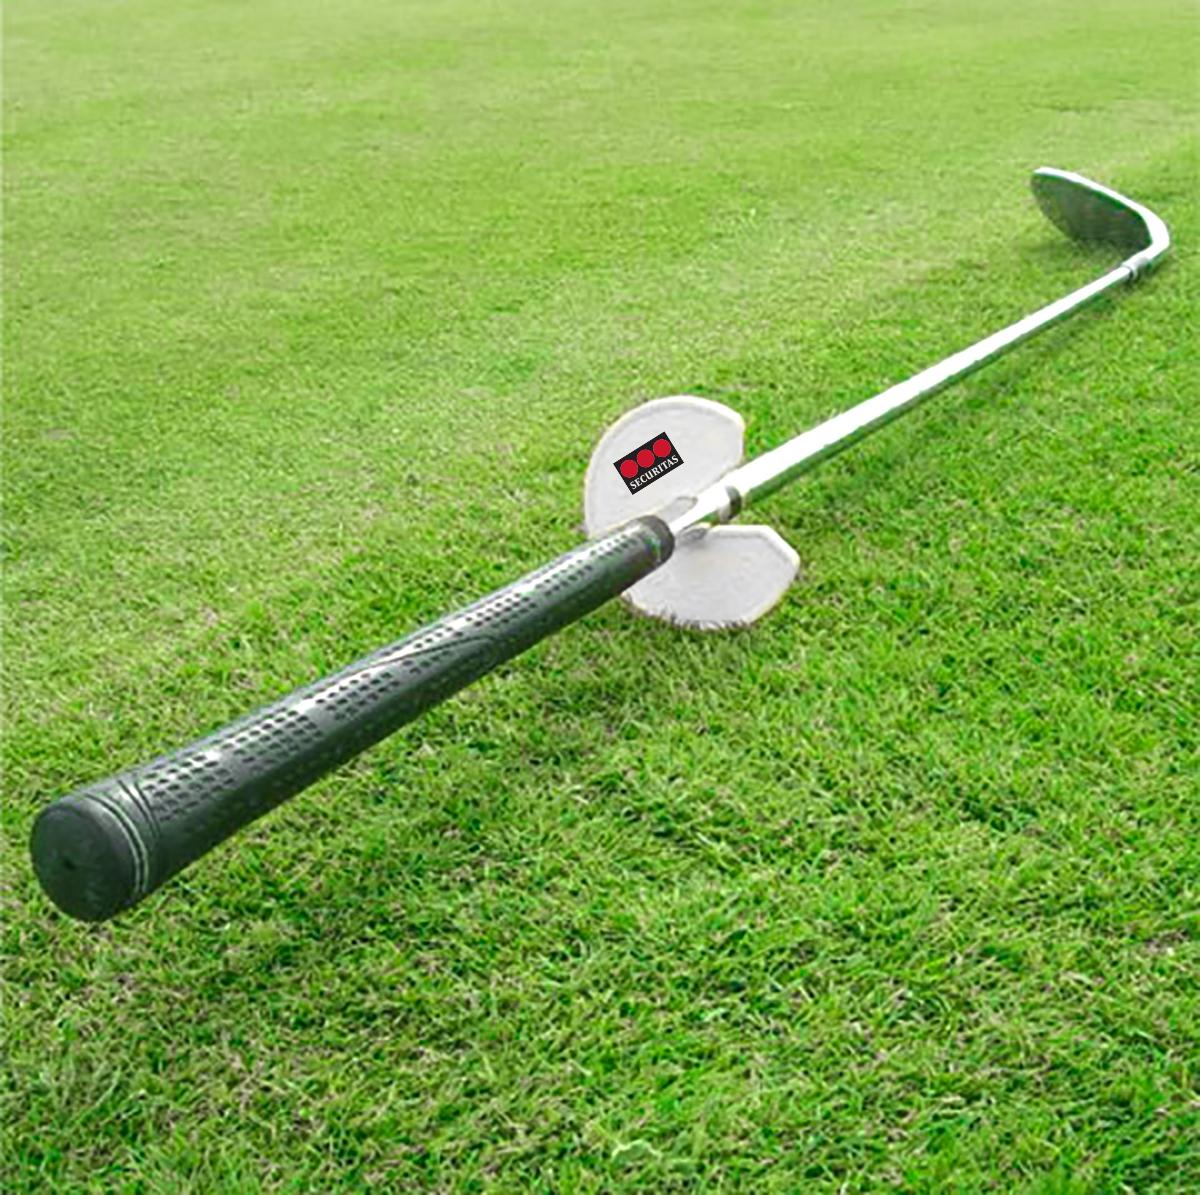 Securitas Grip Dry Golf Club Holder